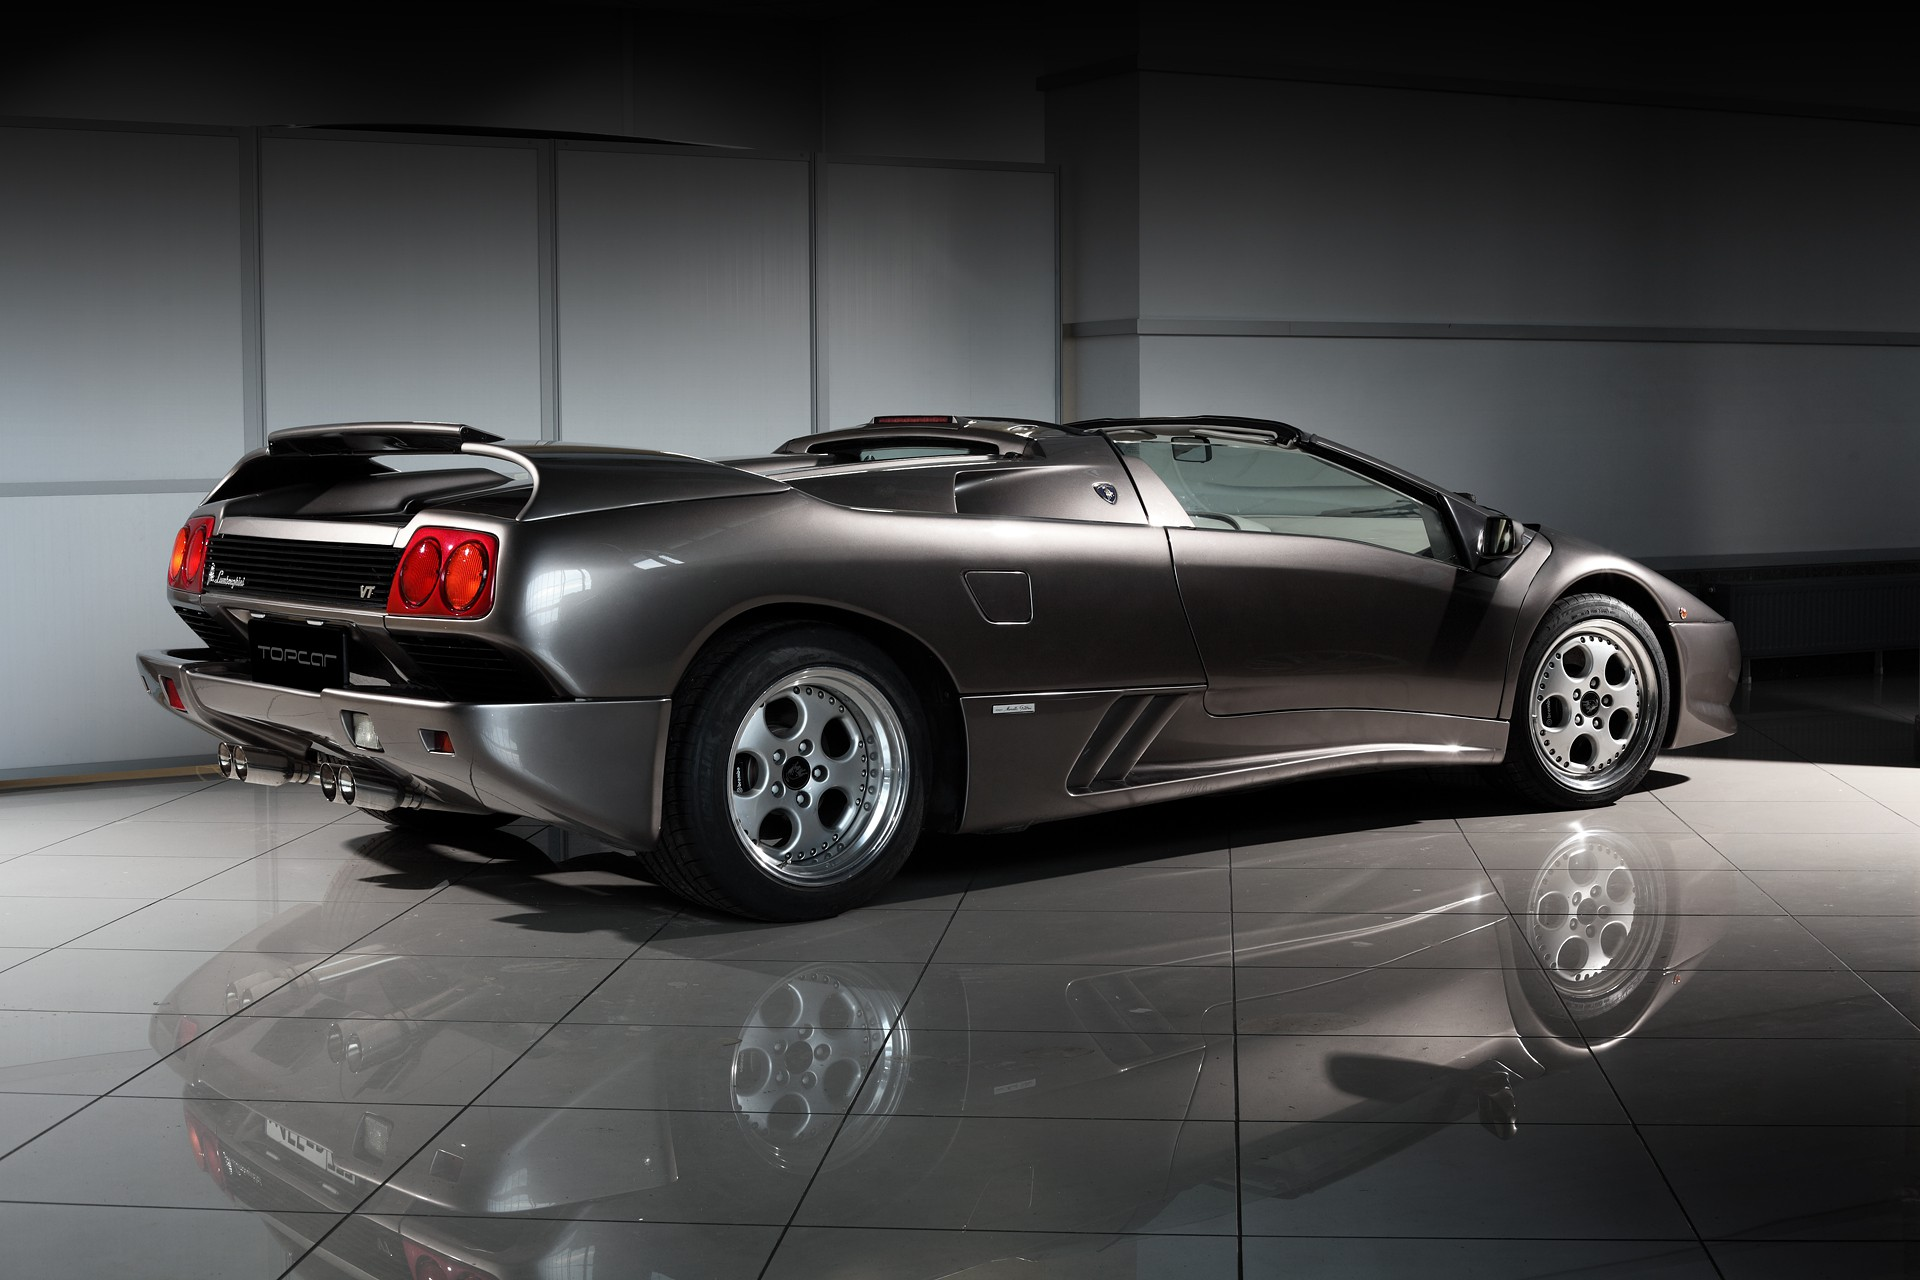 Lamborghini Diablo Vt Roadster Topcar